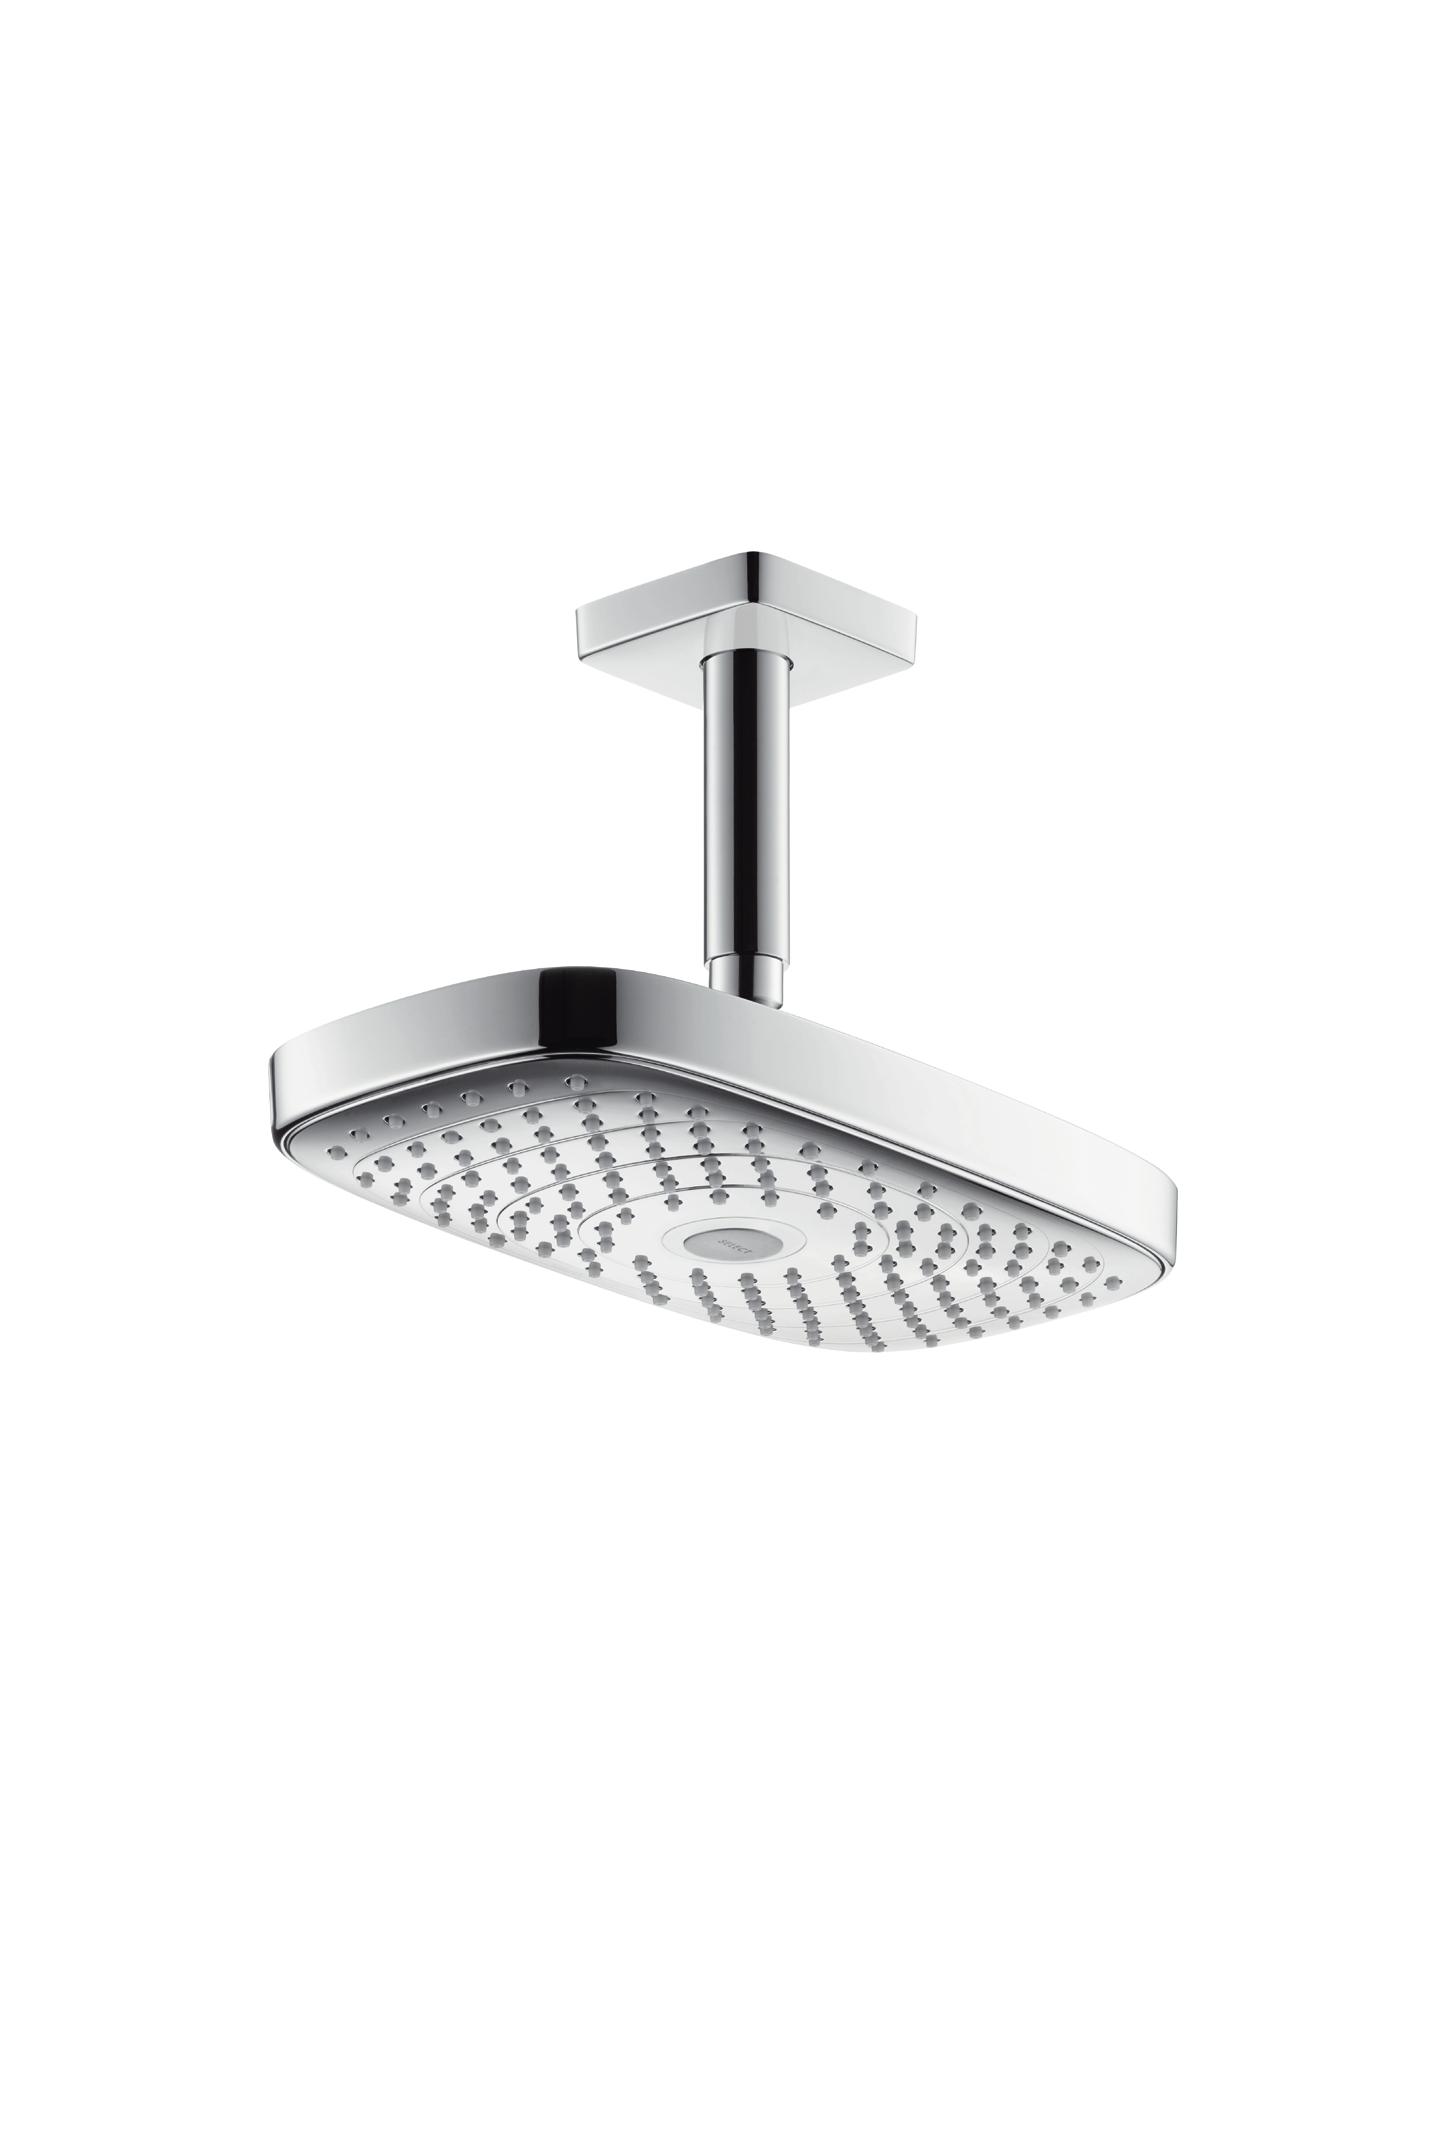 Details About Hansgrohe Shower Head Raindance Select E 300 26608000